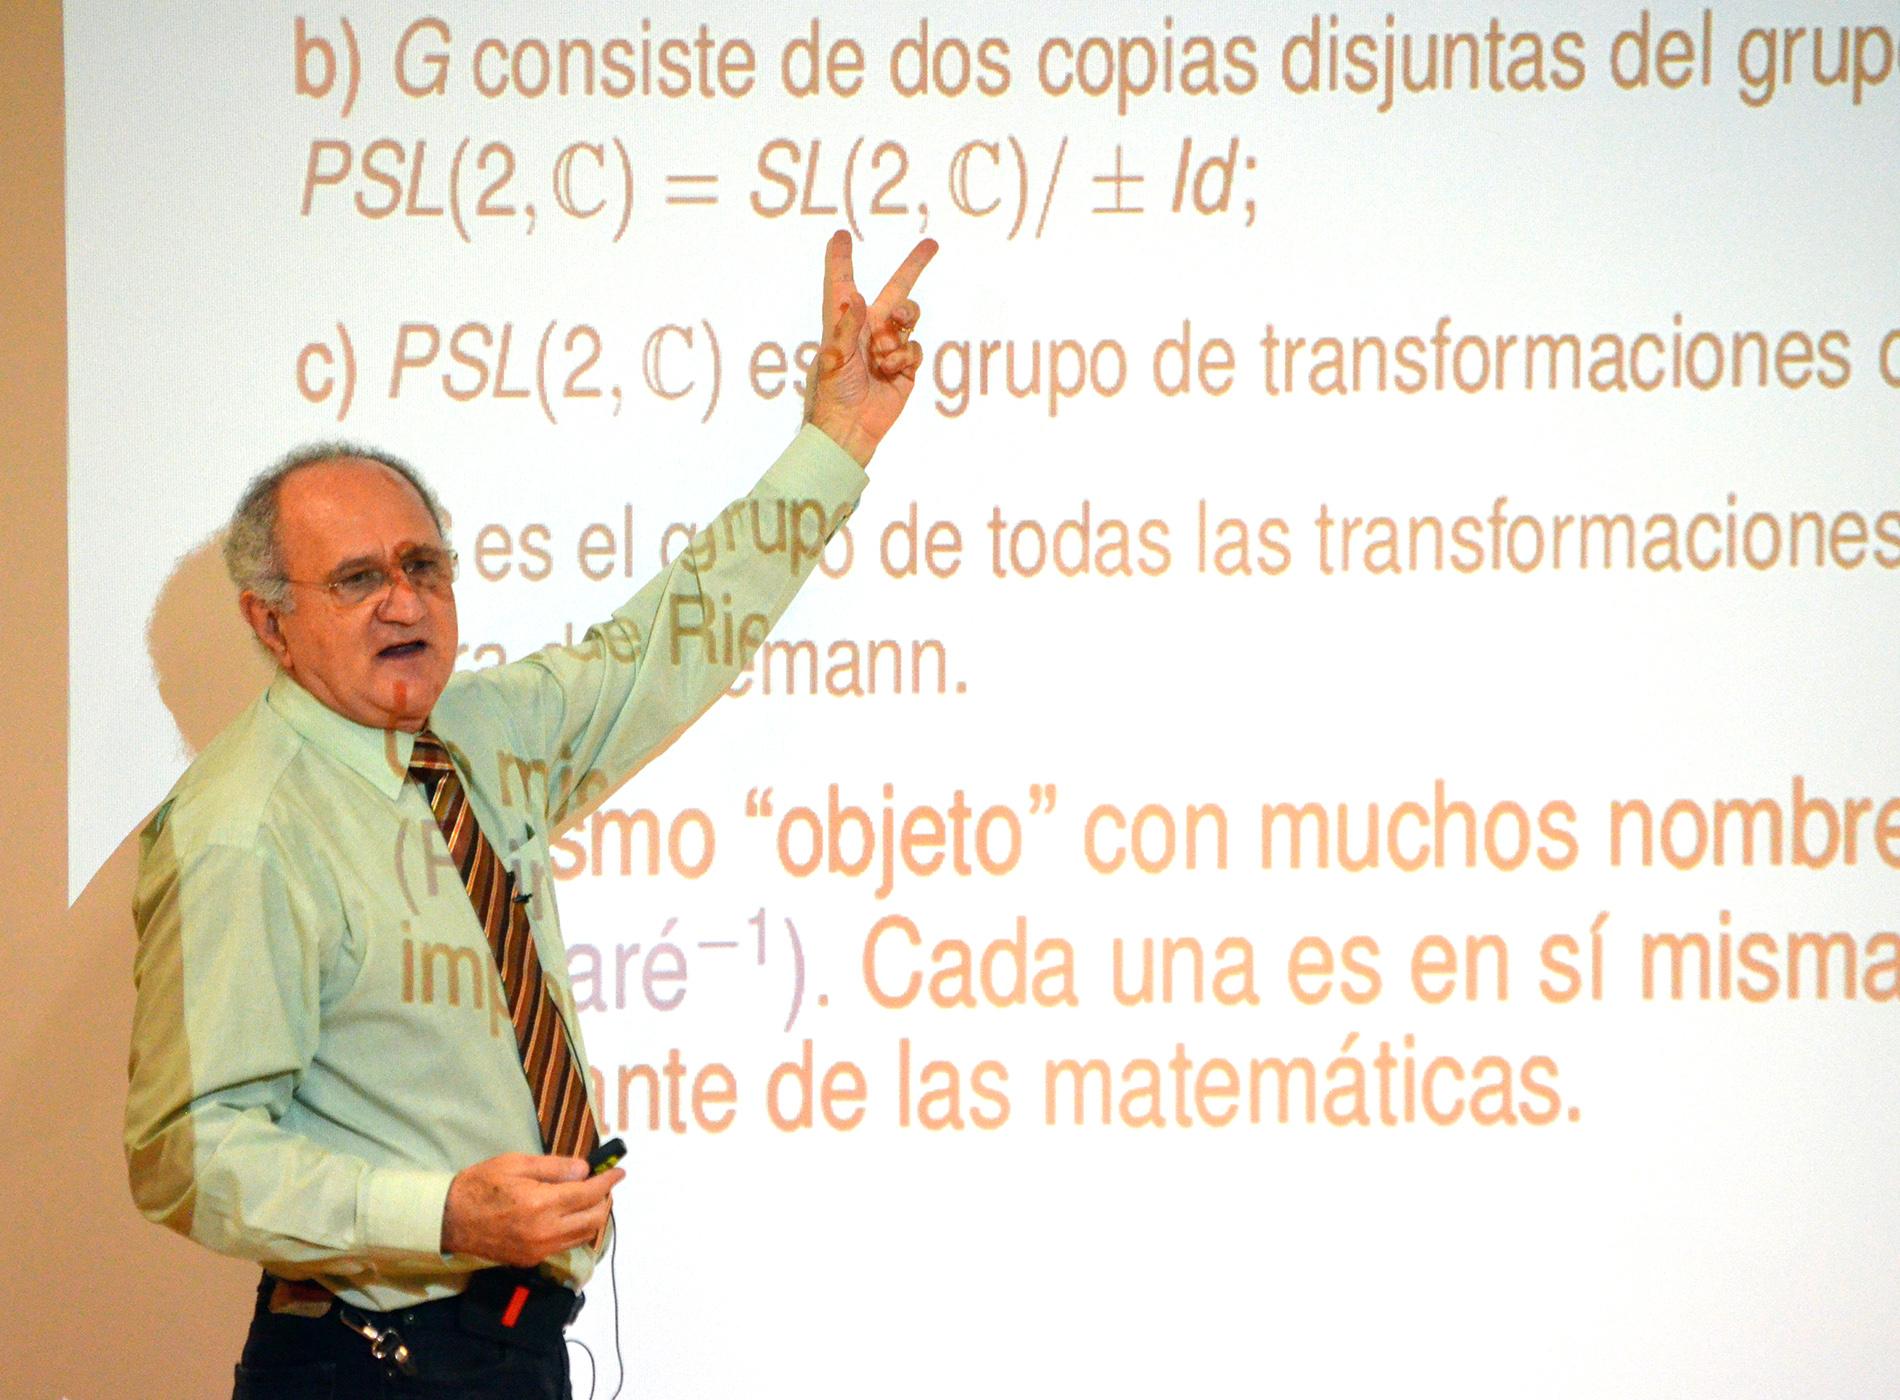 José Seade ha sido galardonado con la Medalla Solomon Lefschetz 2021